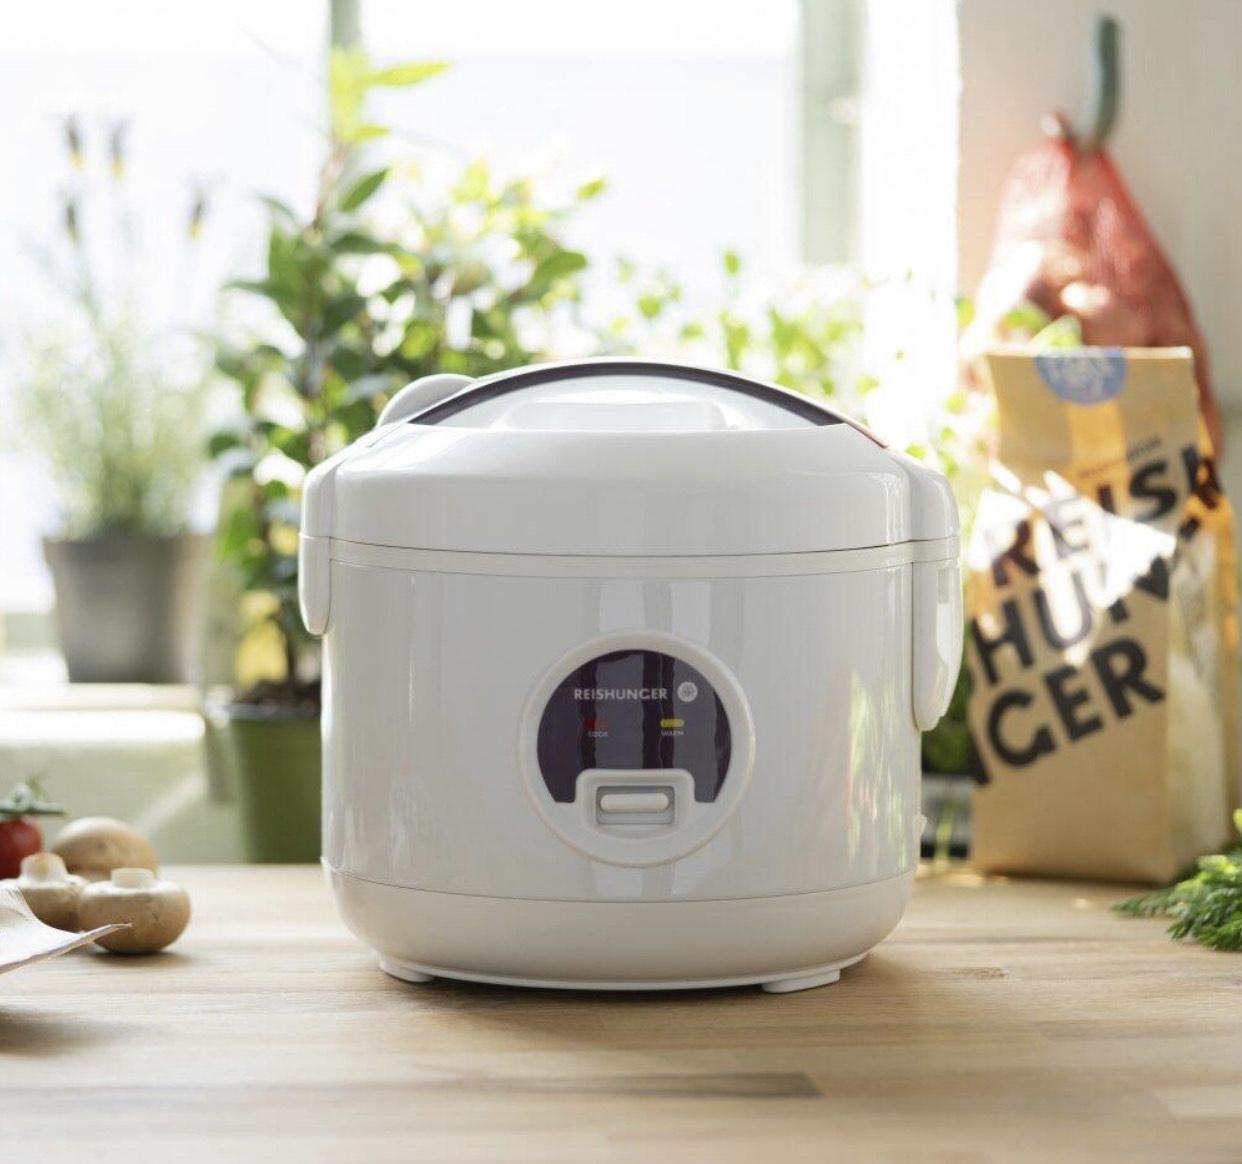 Reishunger Mini Reiskocher (0,6l) + kostensloses Geschenkset bei NL Anmeldung